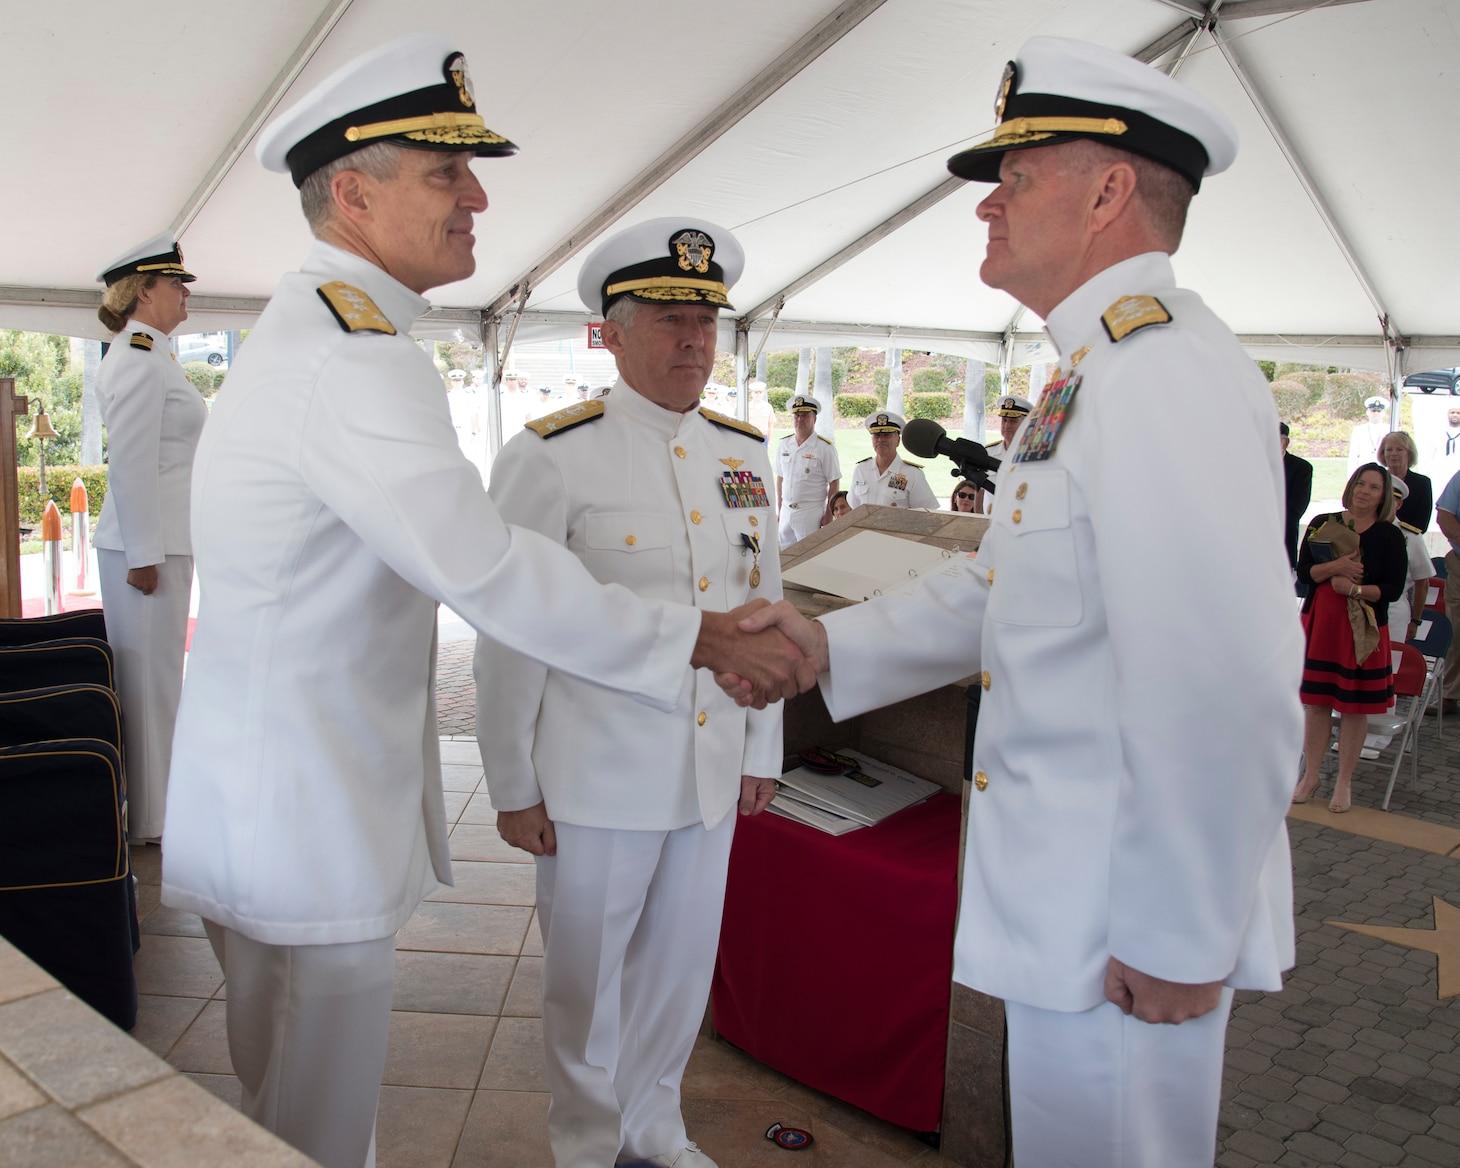 Adm. Samuel J. Paparo, commander, U.S. Pacific Fleet, congratulates Vice Adm. Stephen T. Koehler upon assuming command of U.S. 3rd Fleet during a change of command ceremony on Naval Base Point Loma, June 3.